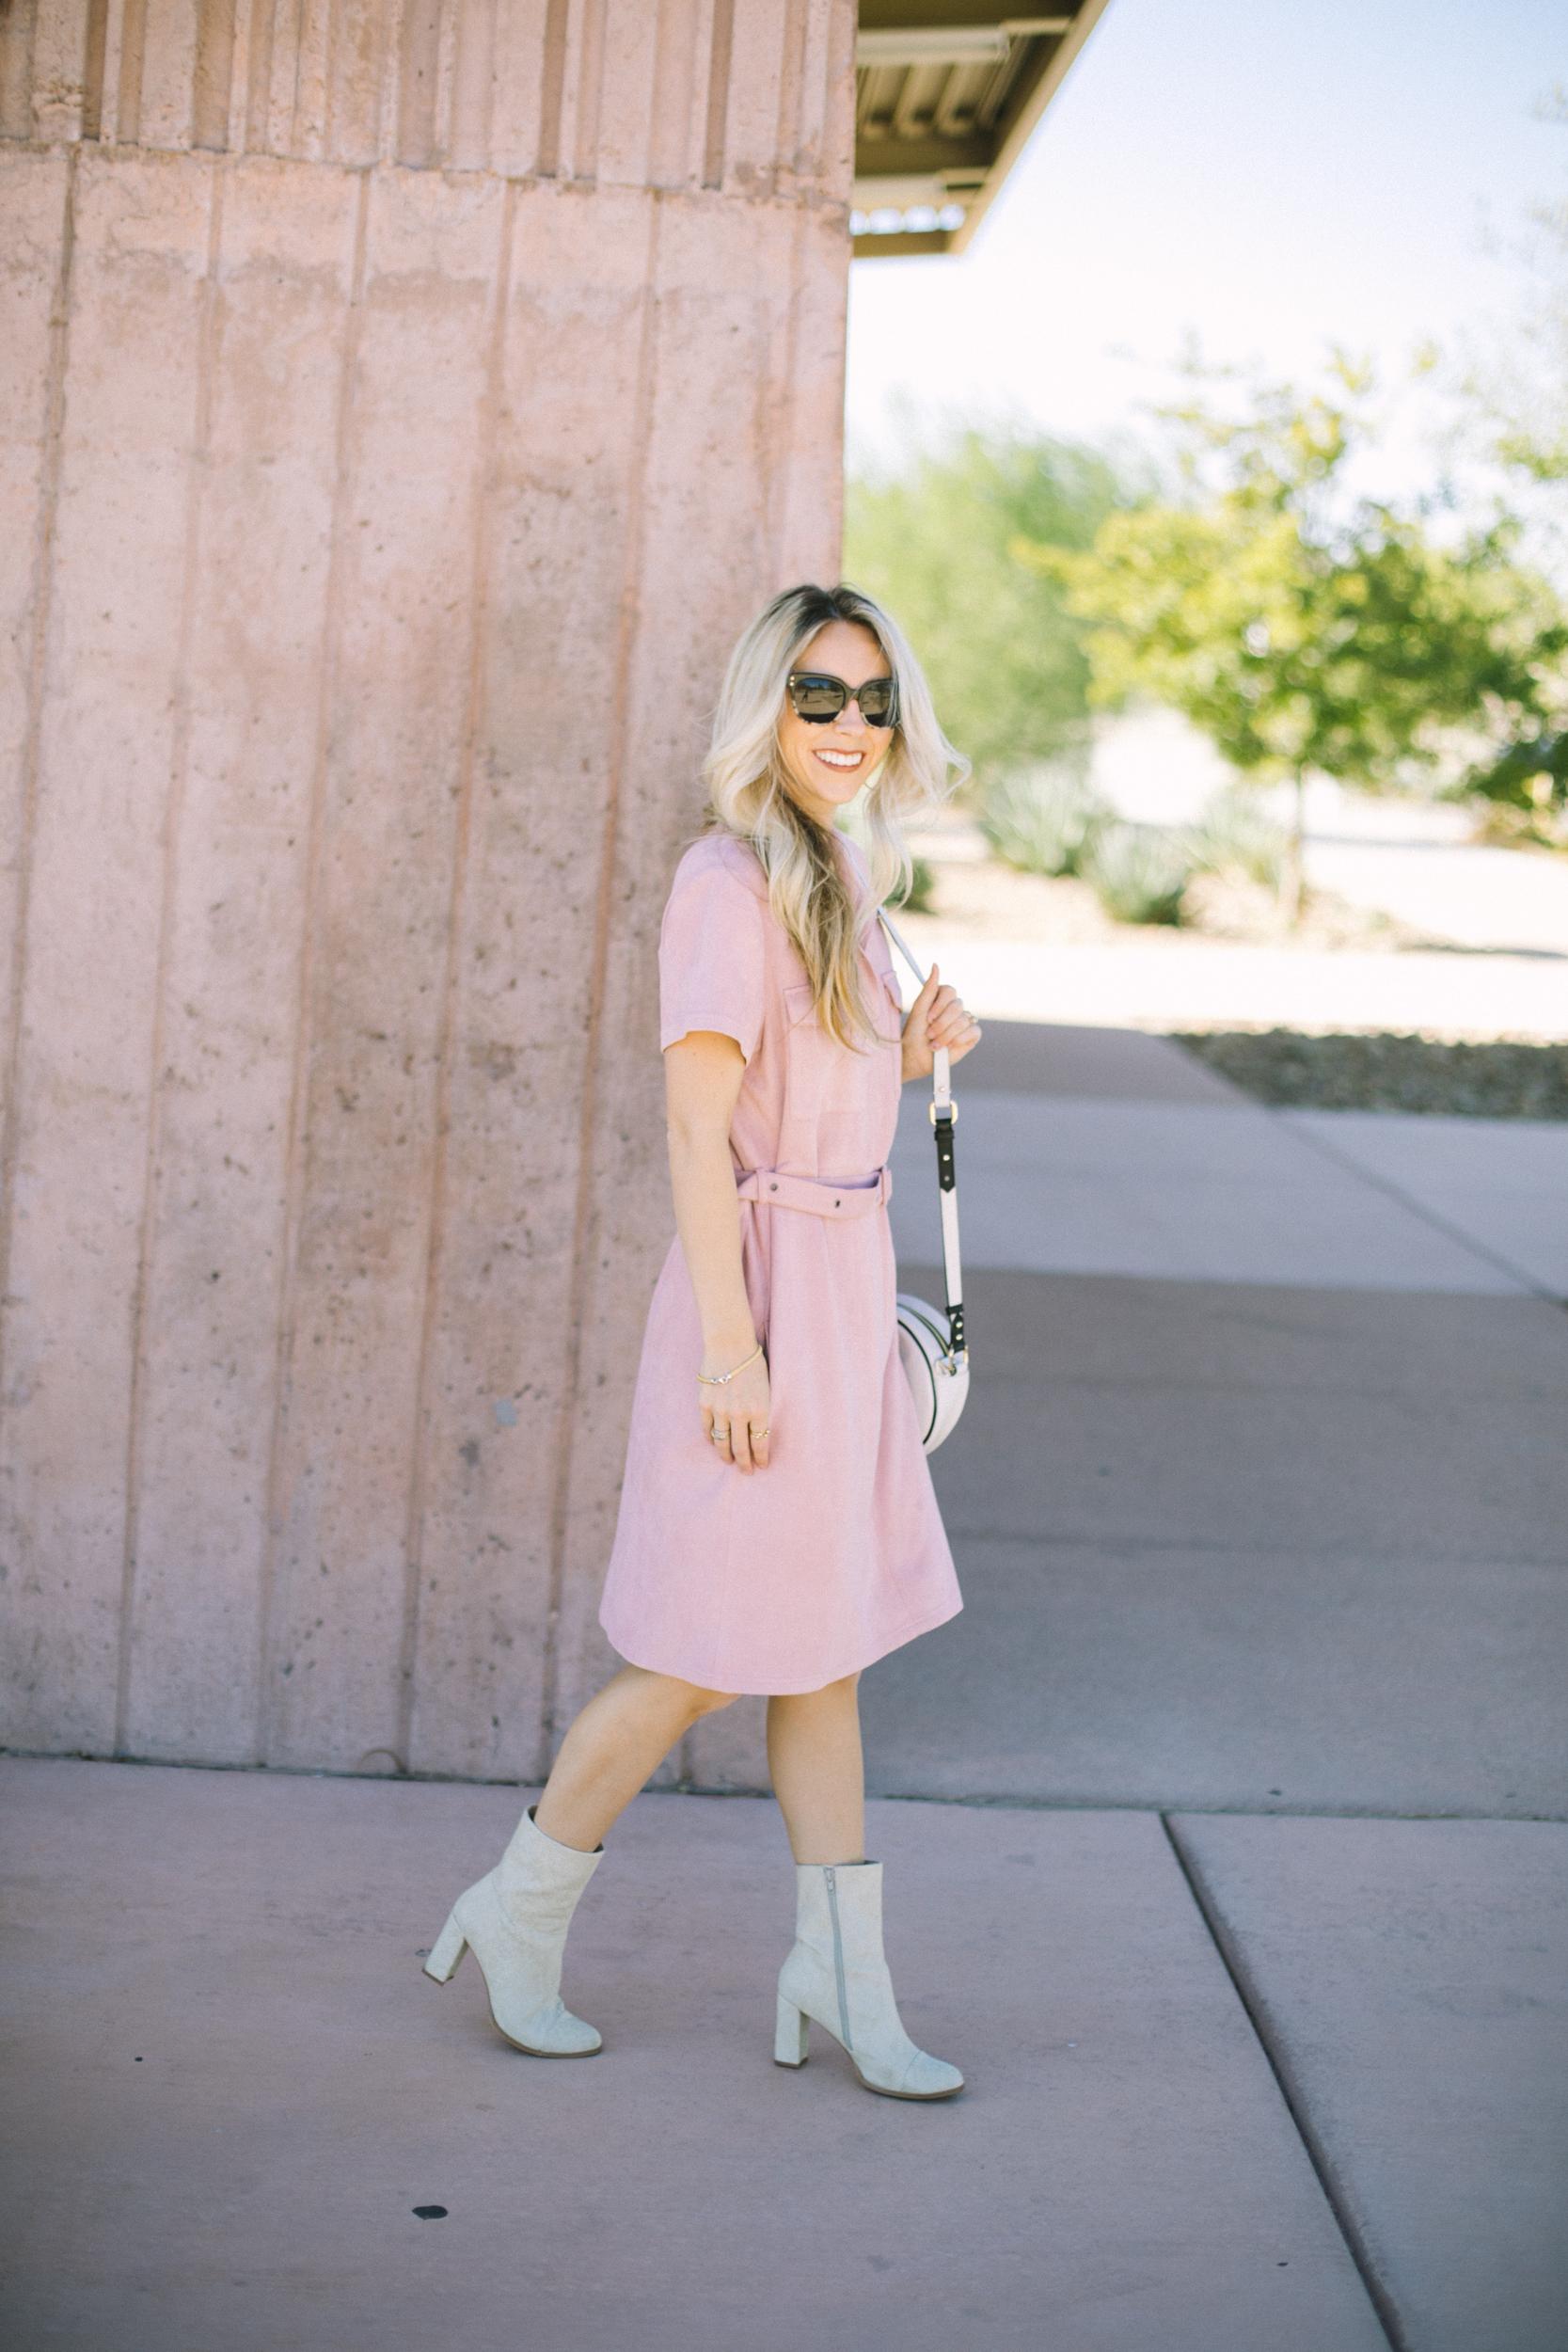 Pink Midi Dress by Las Vegas fashion bloggers Life of a Sister